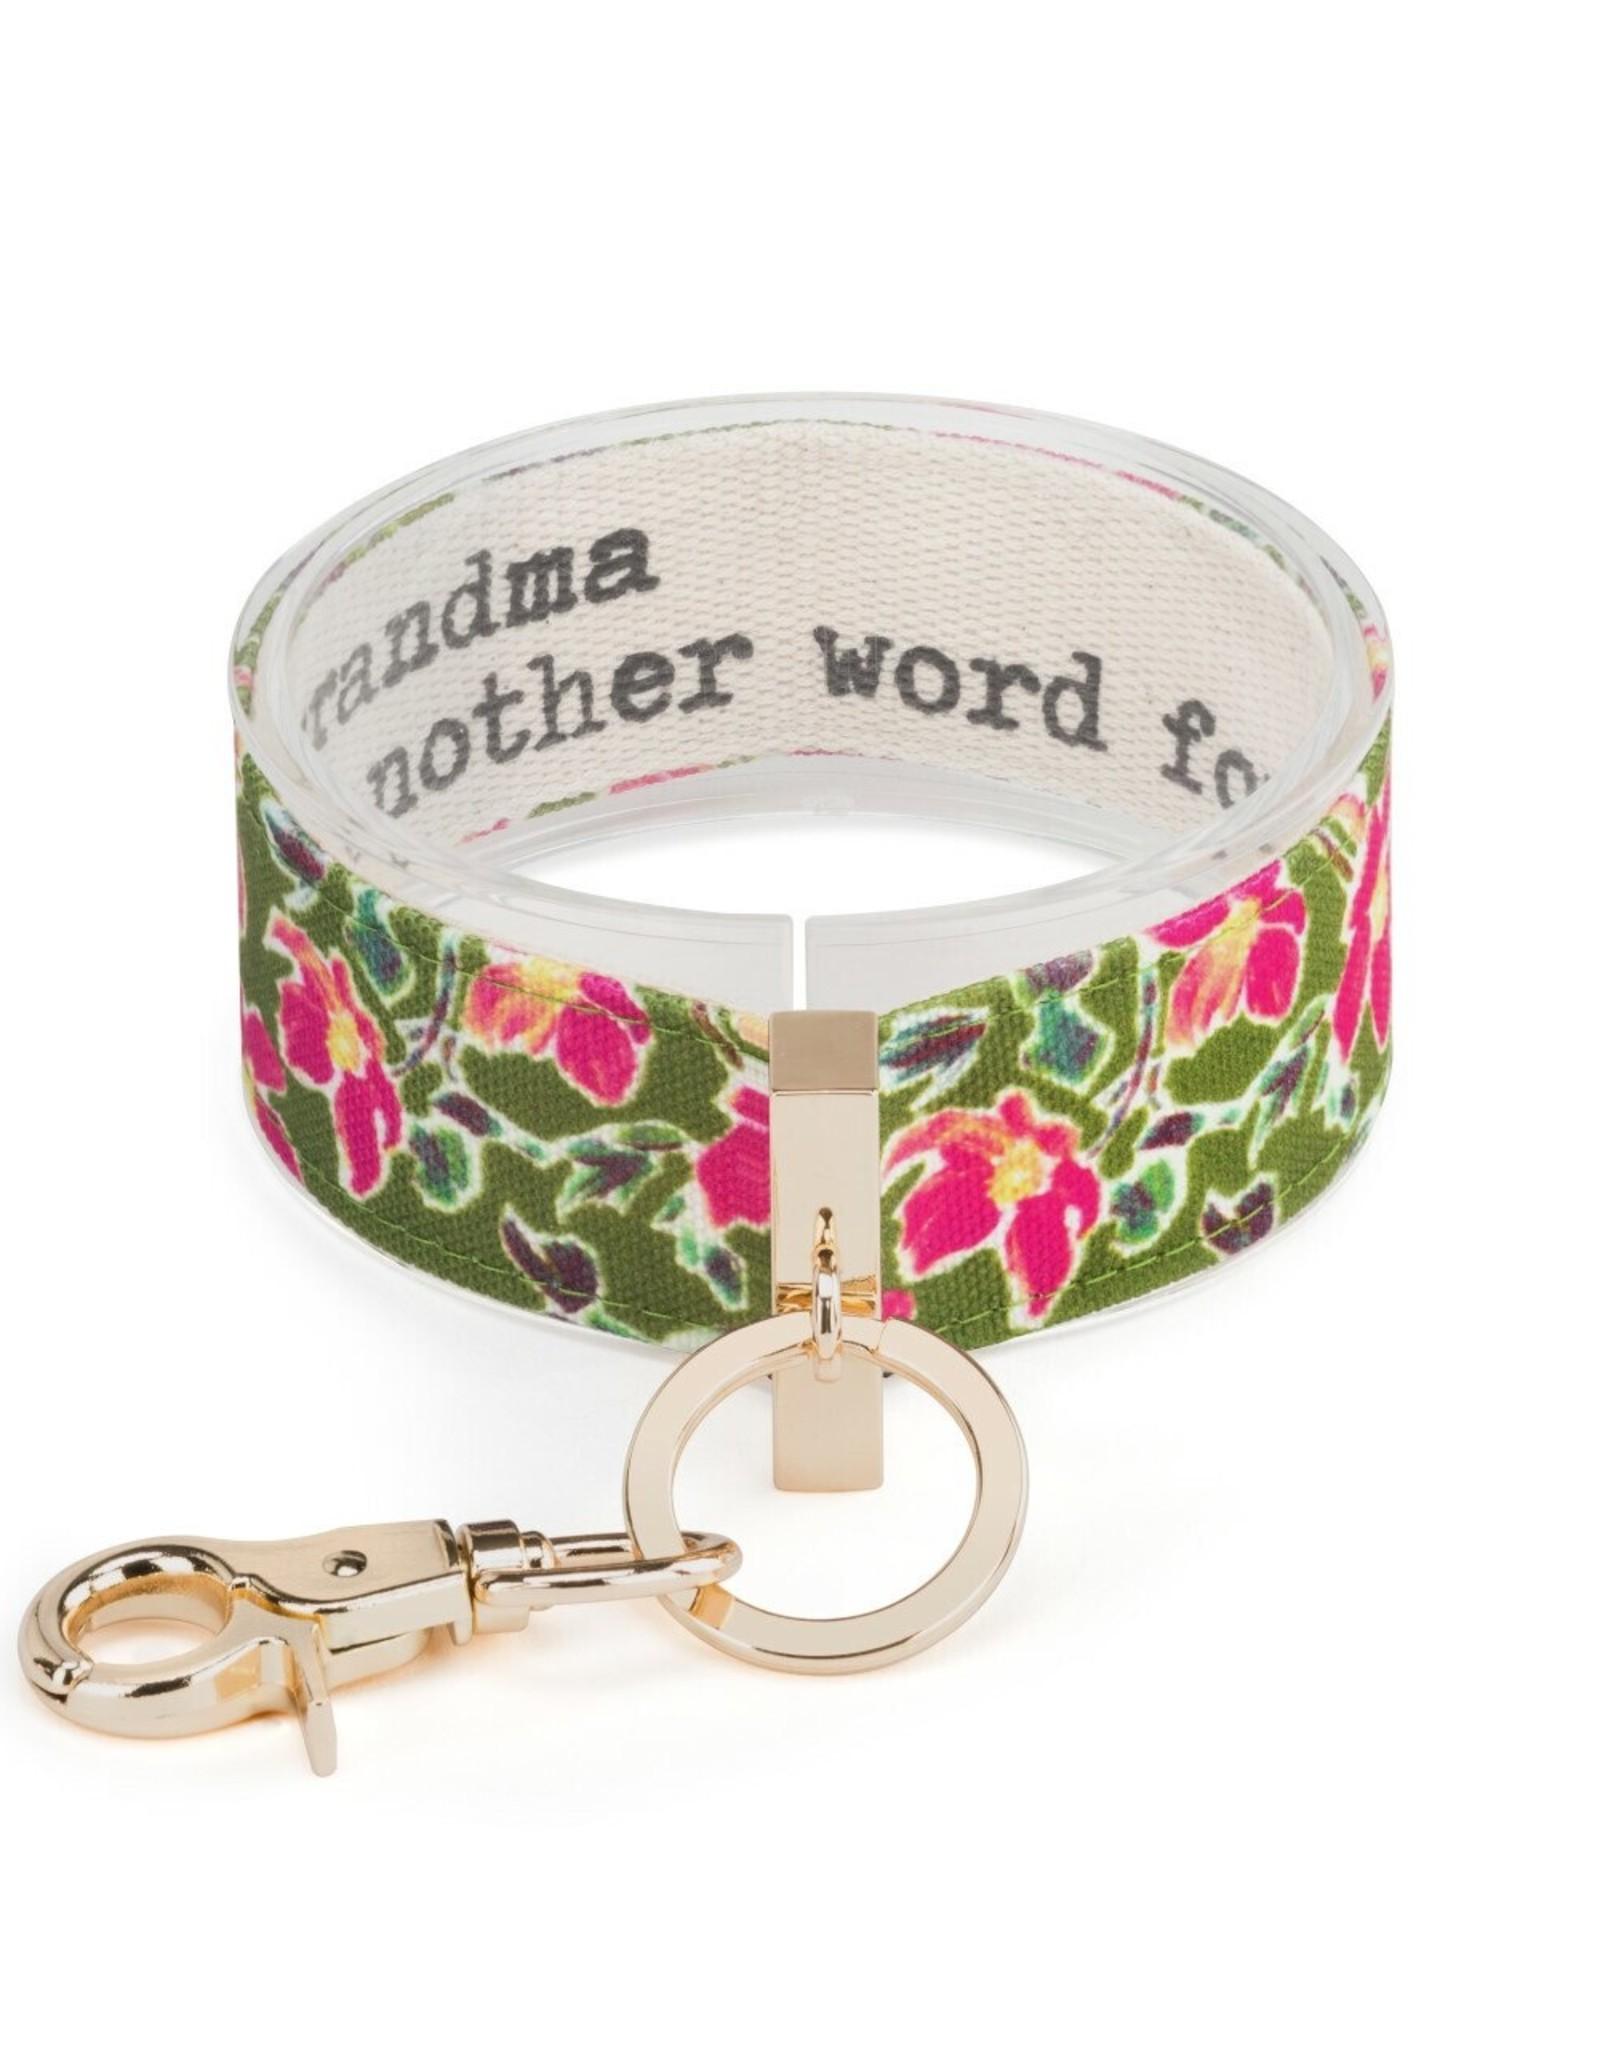 Wrist Strap Key Chain, Grandma Word for Love